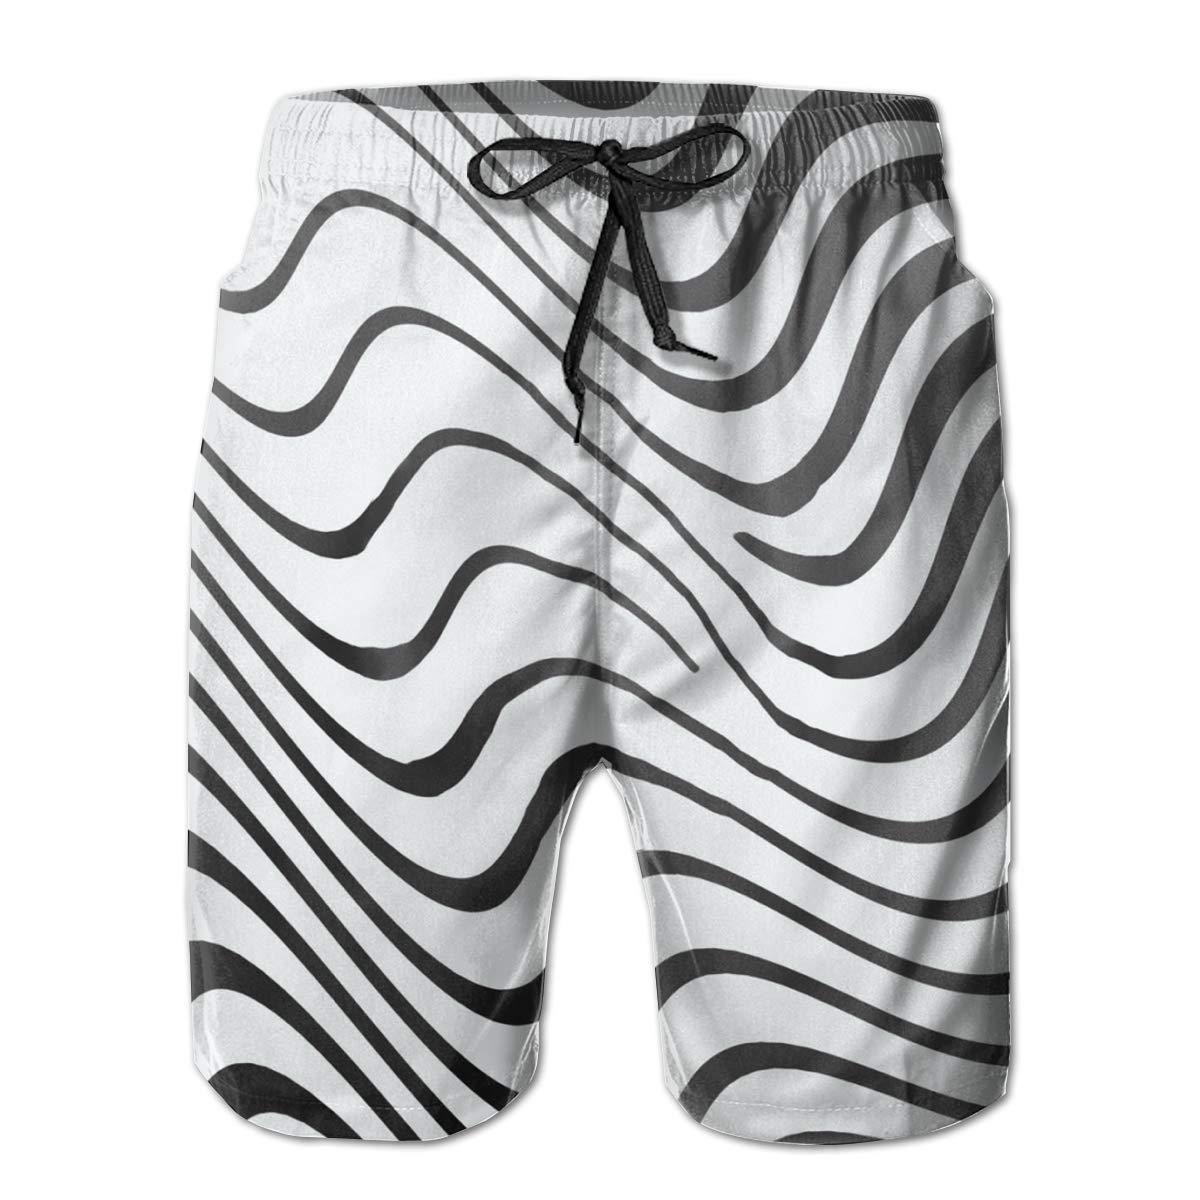 FUNSTYEET Zebra Ripple Mens Board Shorts Swim Mesh Lining and Side Pocket